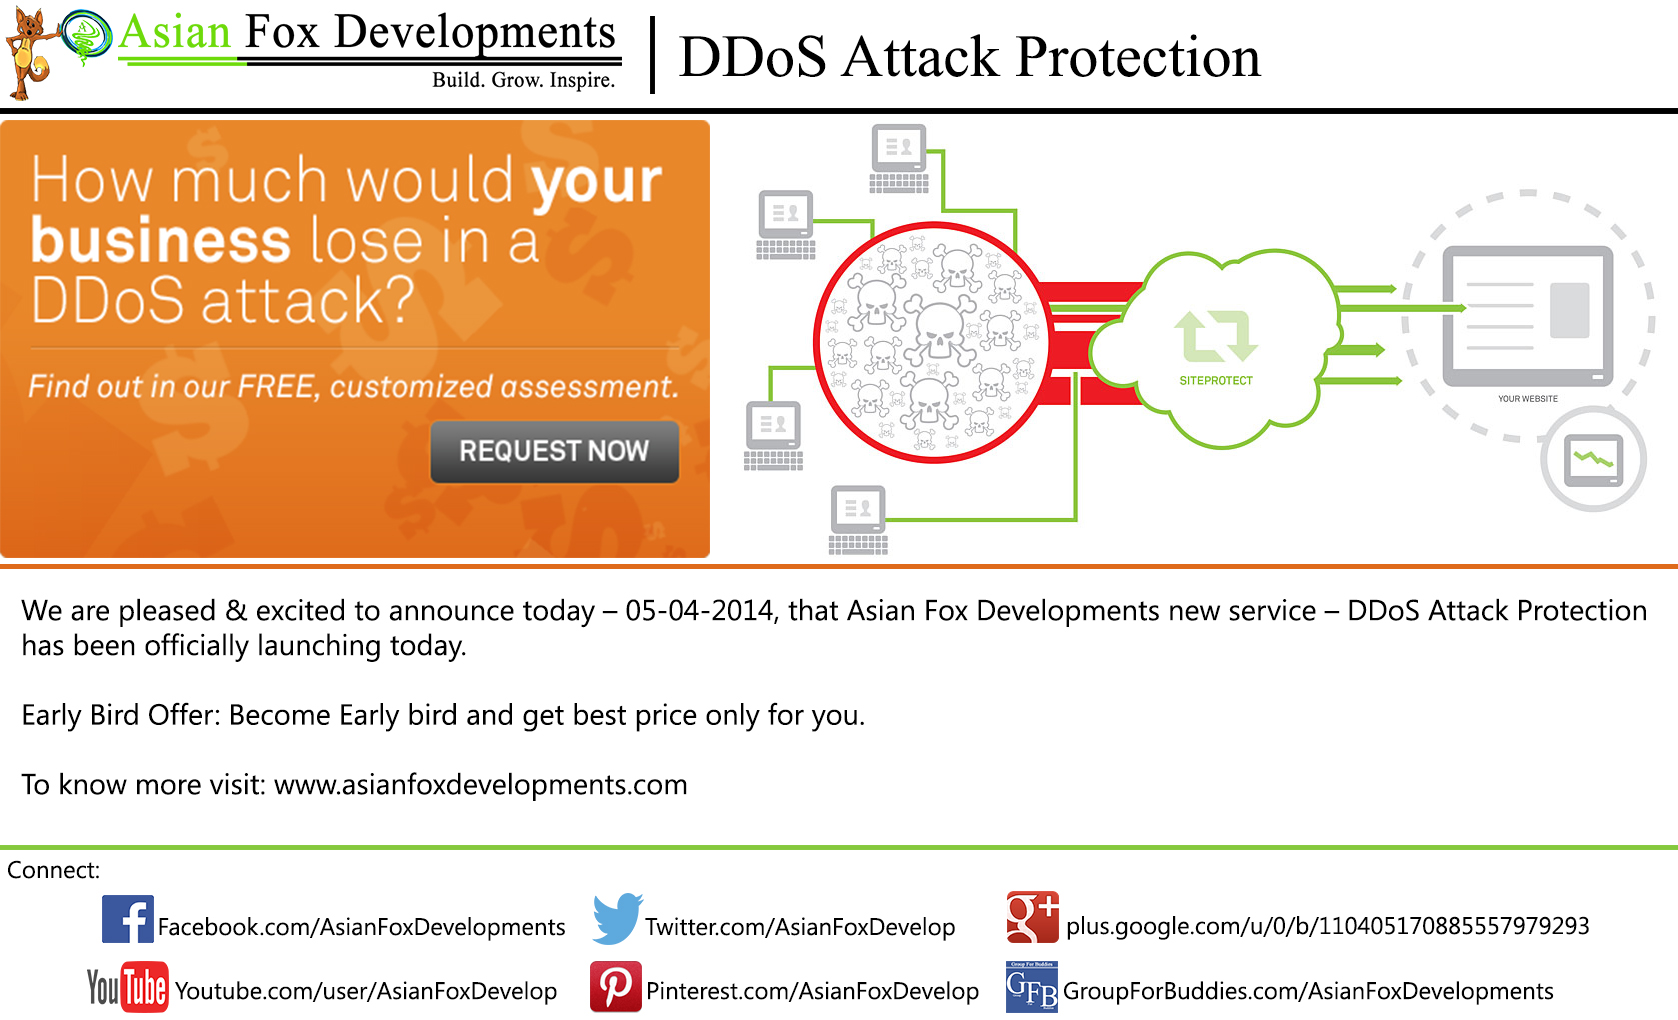 Asian Fox Developments - DDoS Attack Protection